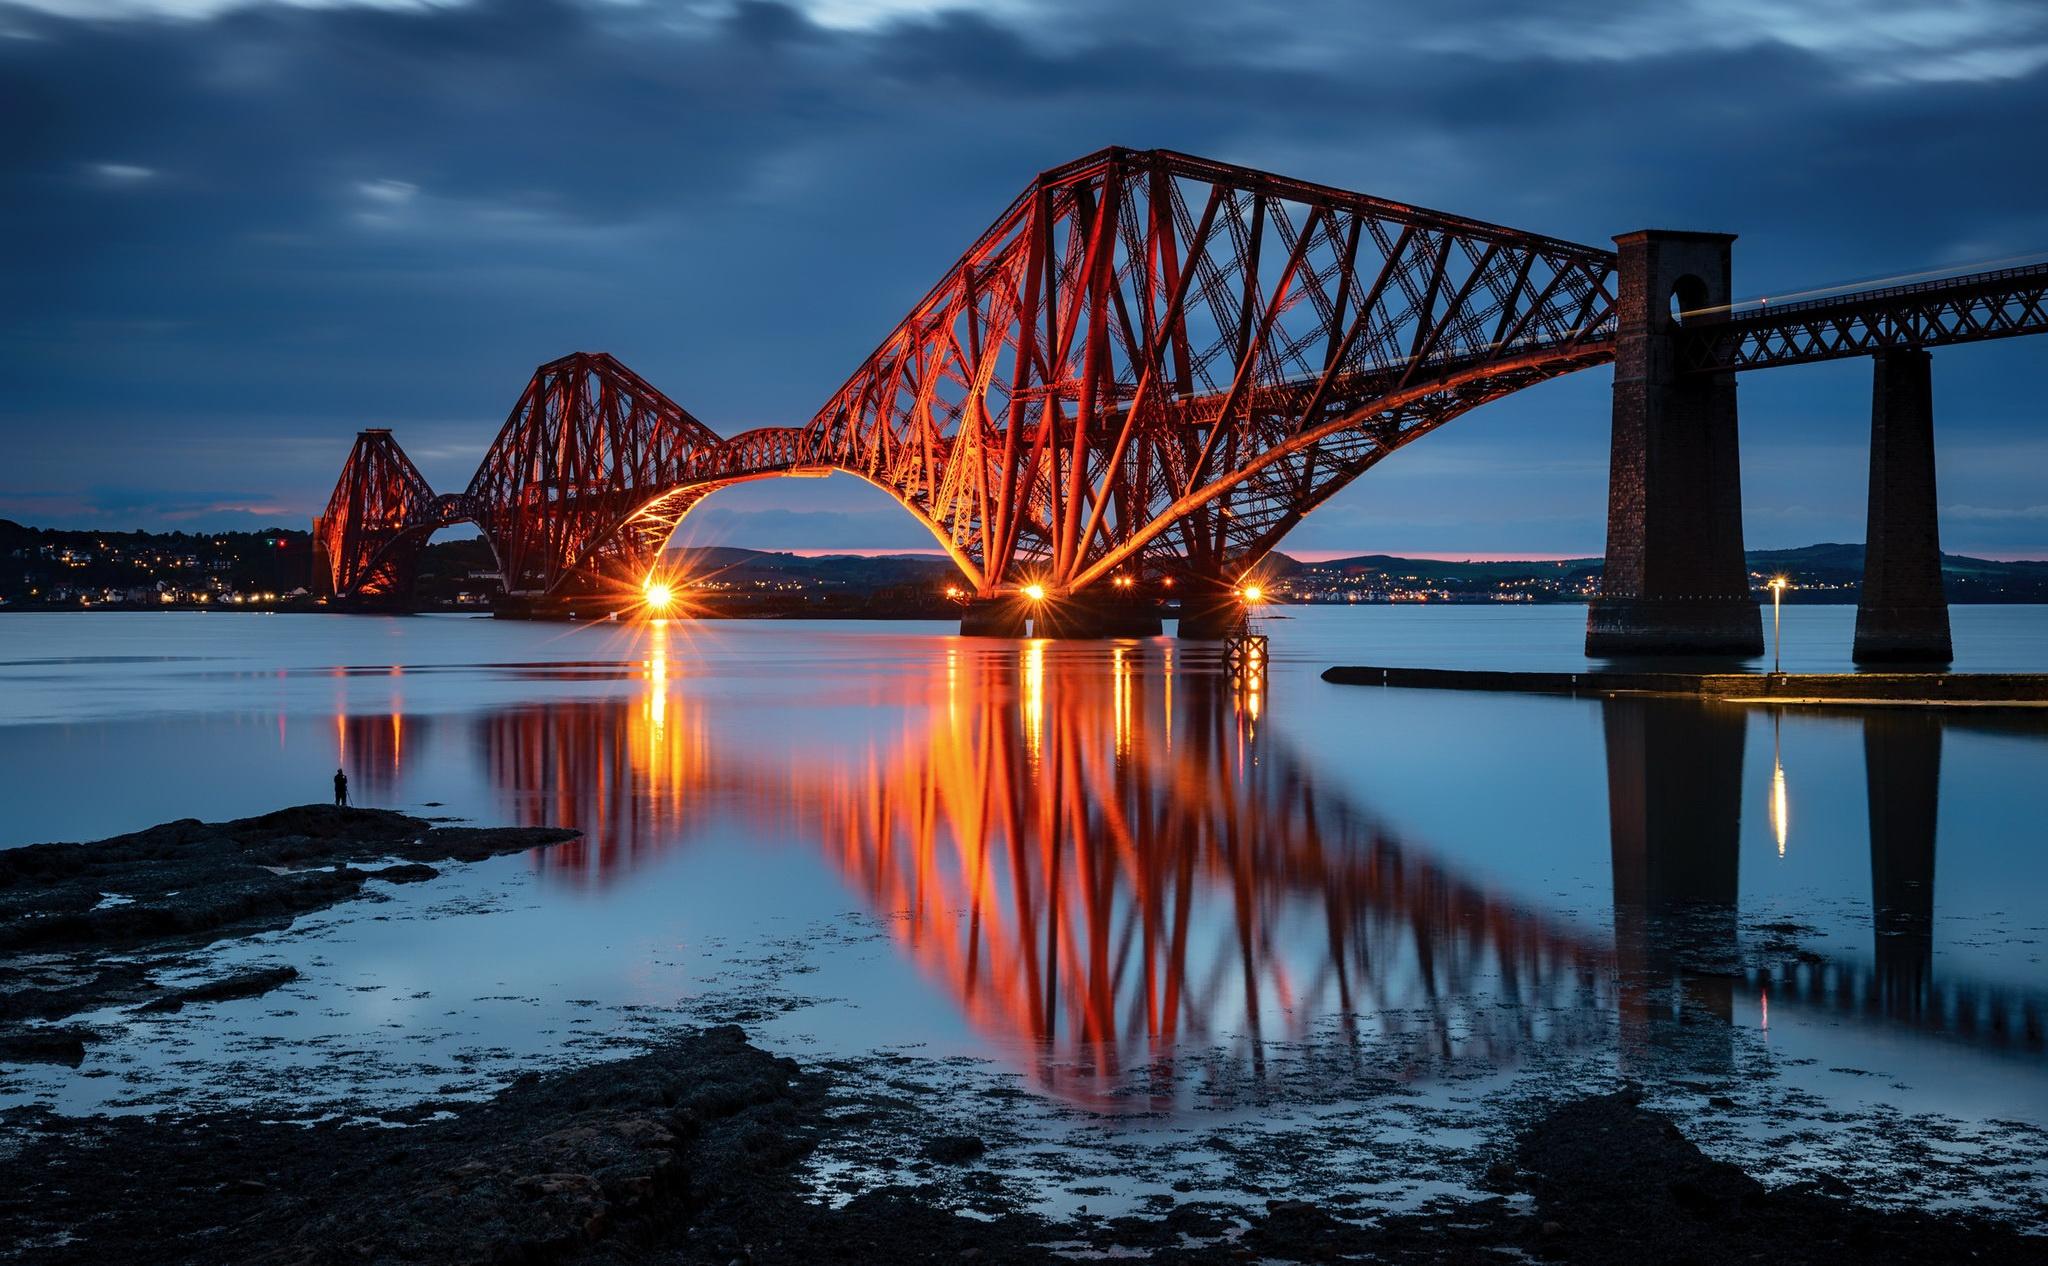 Bridge Edinburgh Forth Bridge Reflection Scotland 2048x1266